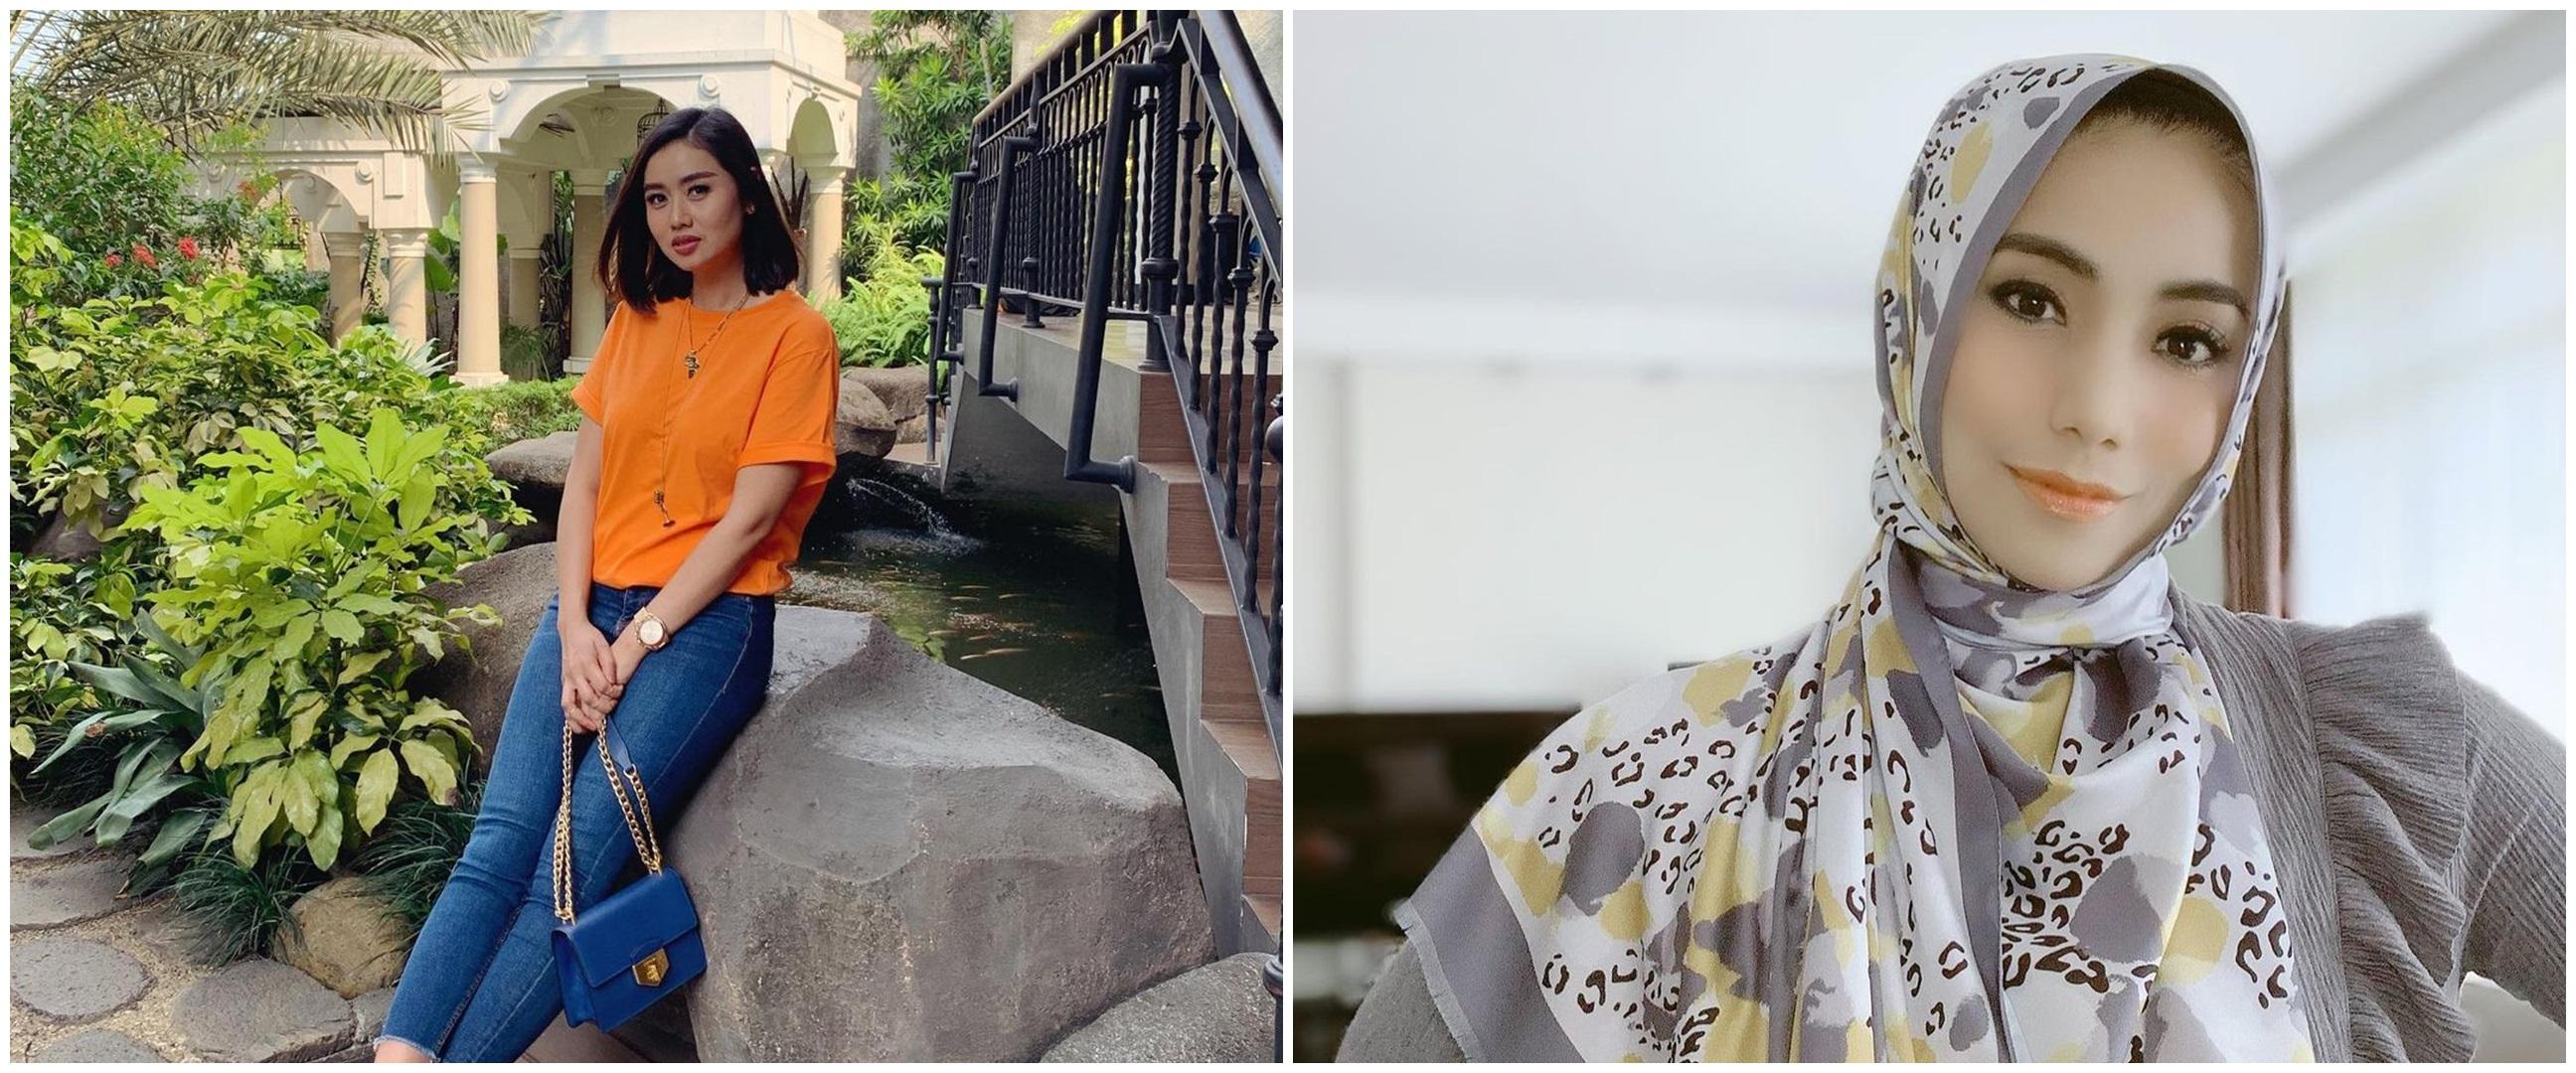 Potret rumah 10 jebolan KDI, punya Siti elegan bernuansa cokelat